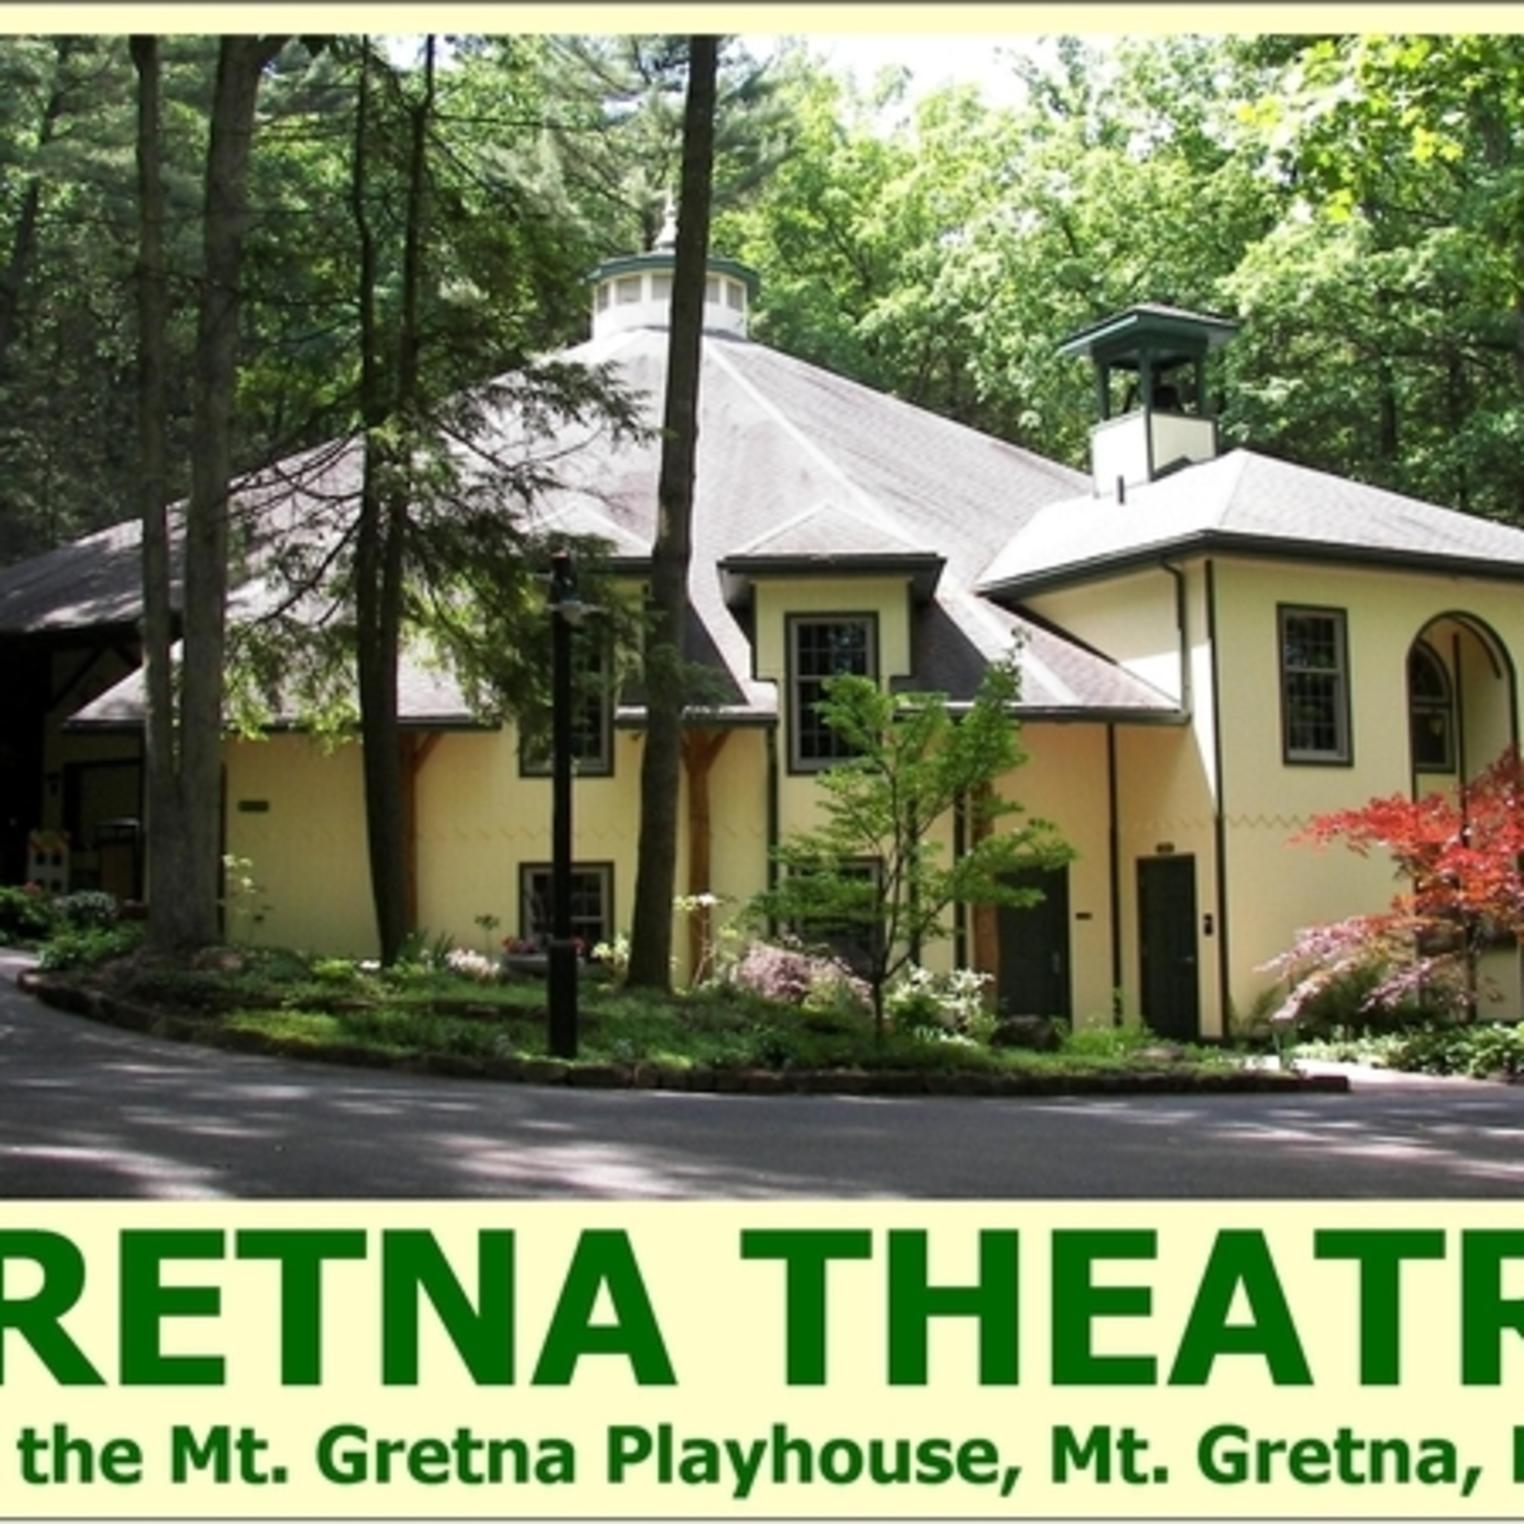 Gretna Theatre